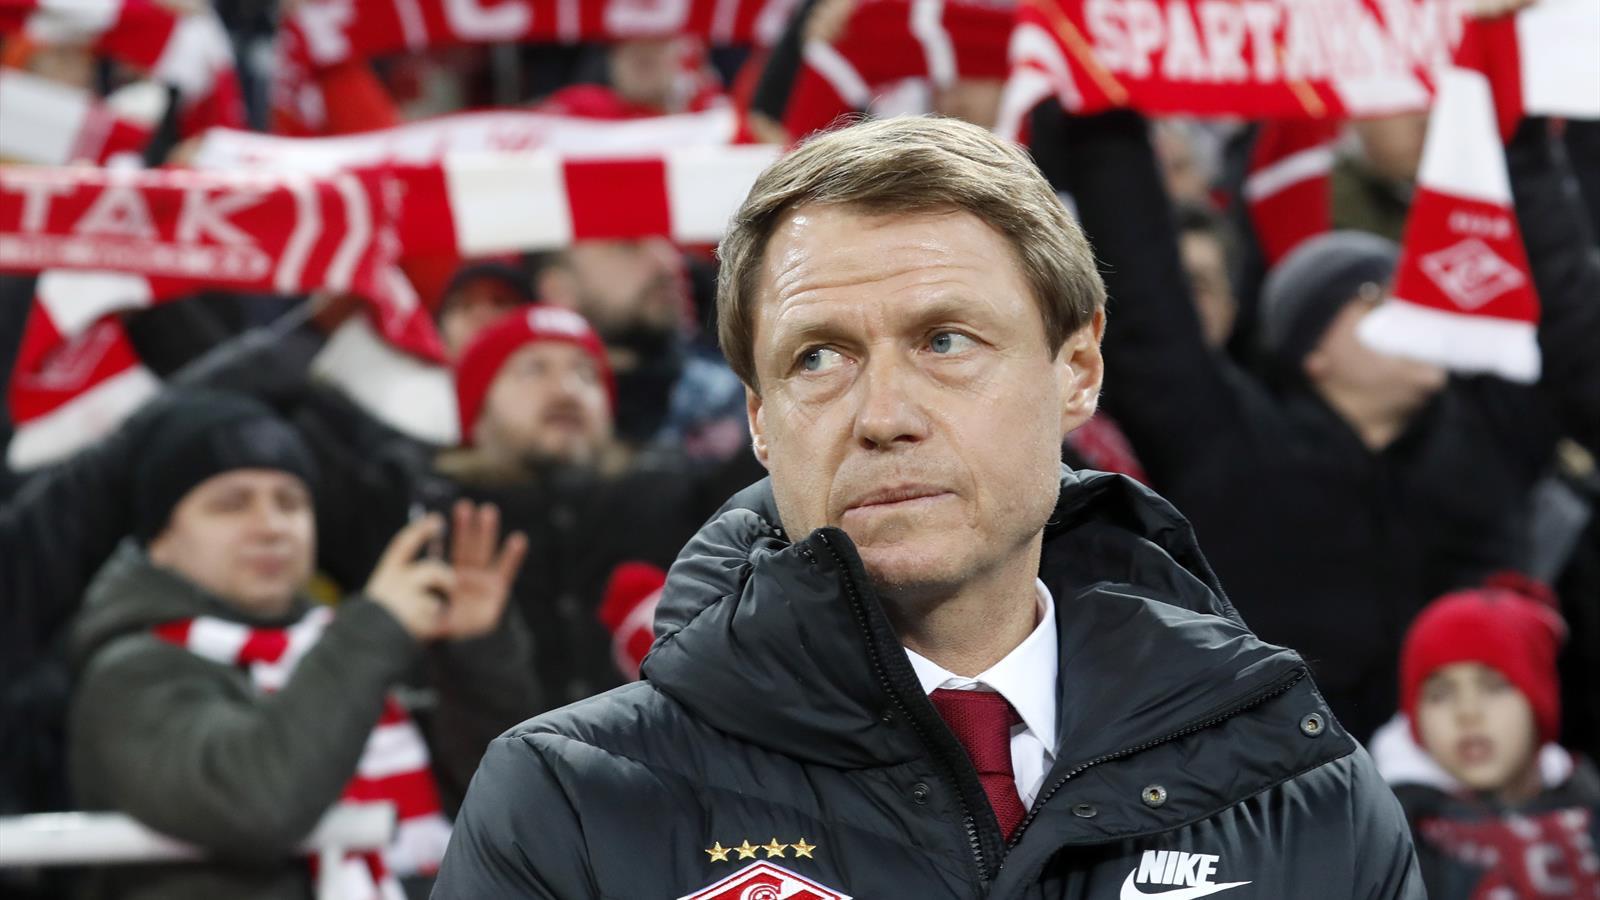 Журналист Василий Уткин раскритиковал главного тренера «Спартака» Олега Кононова